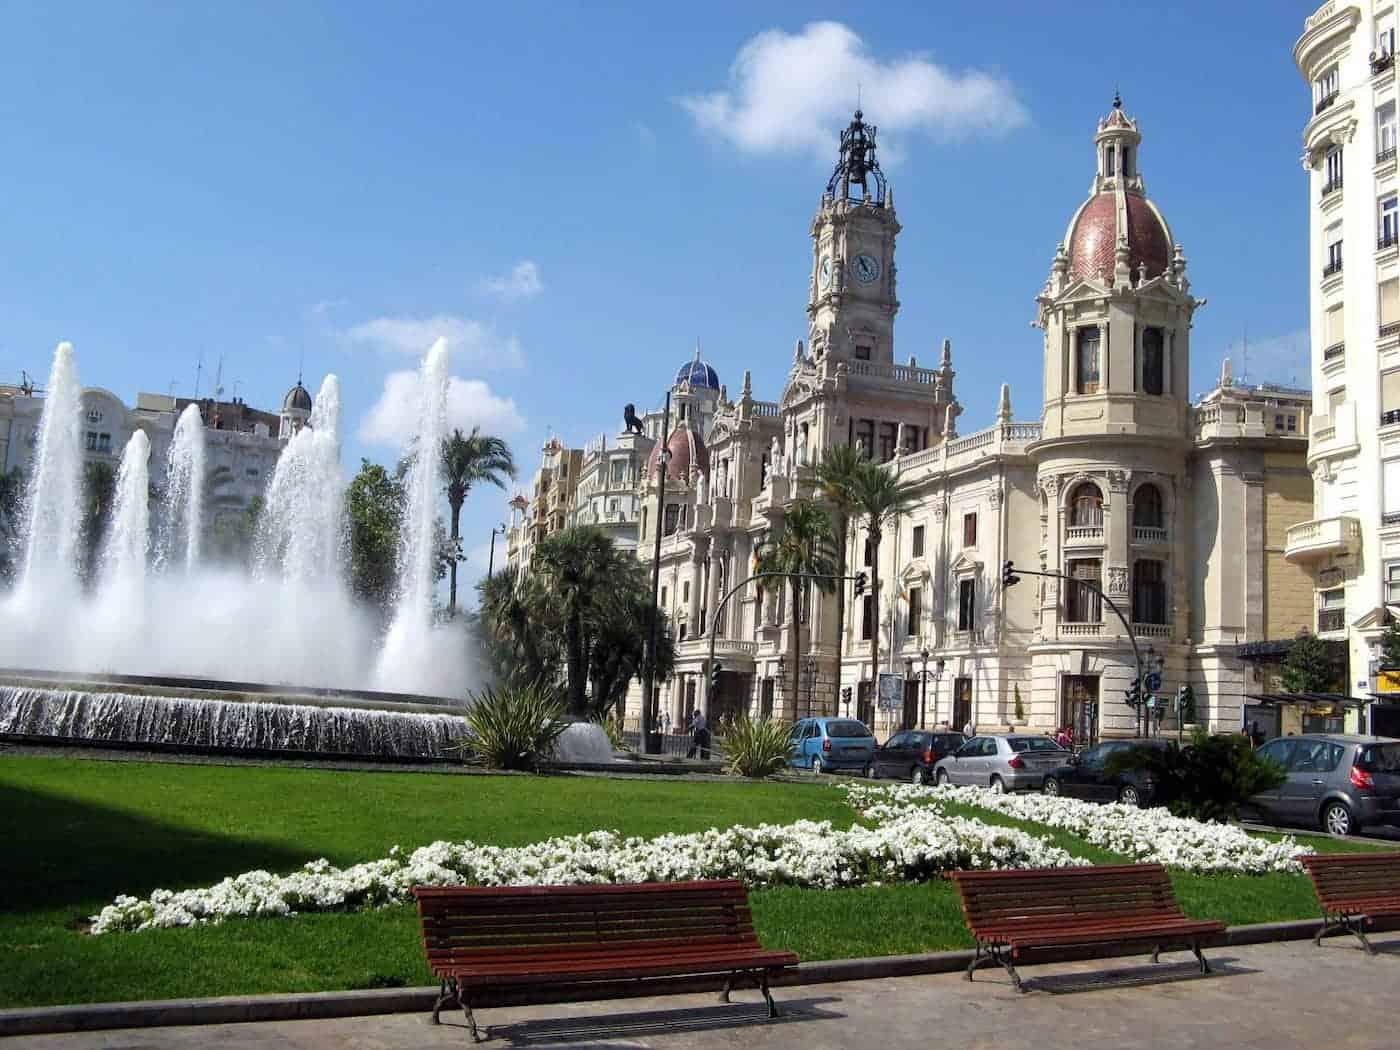 Museos en Valencia, España